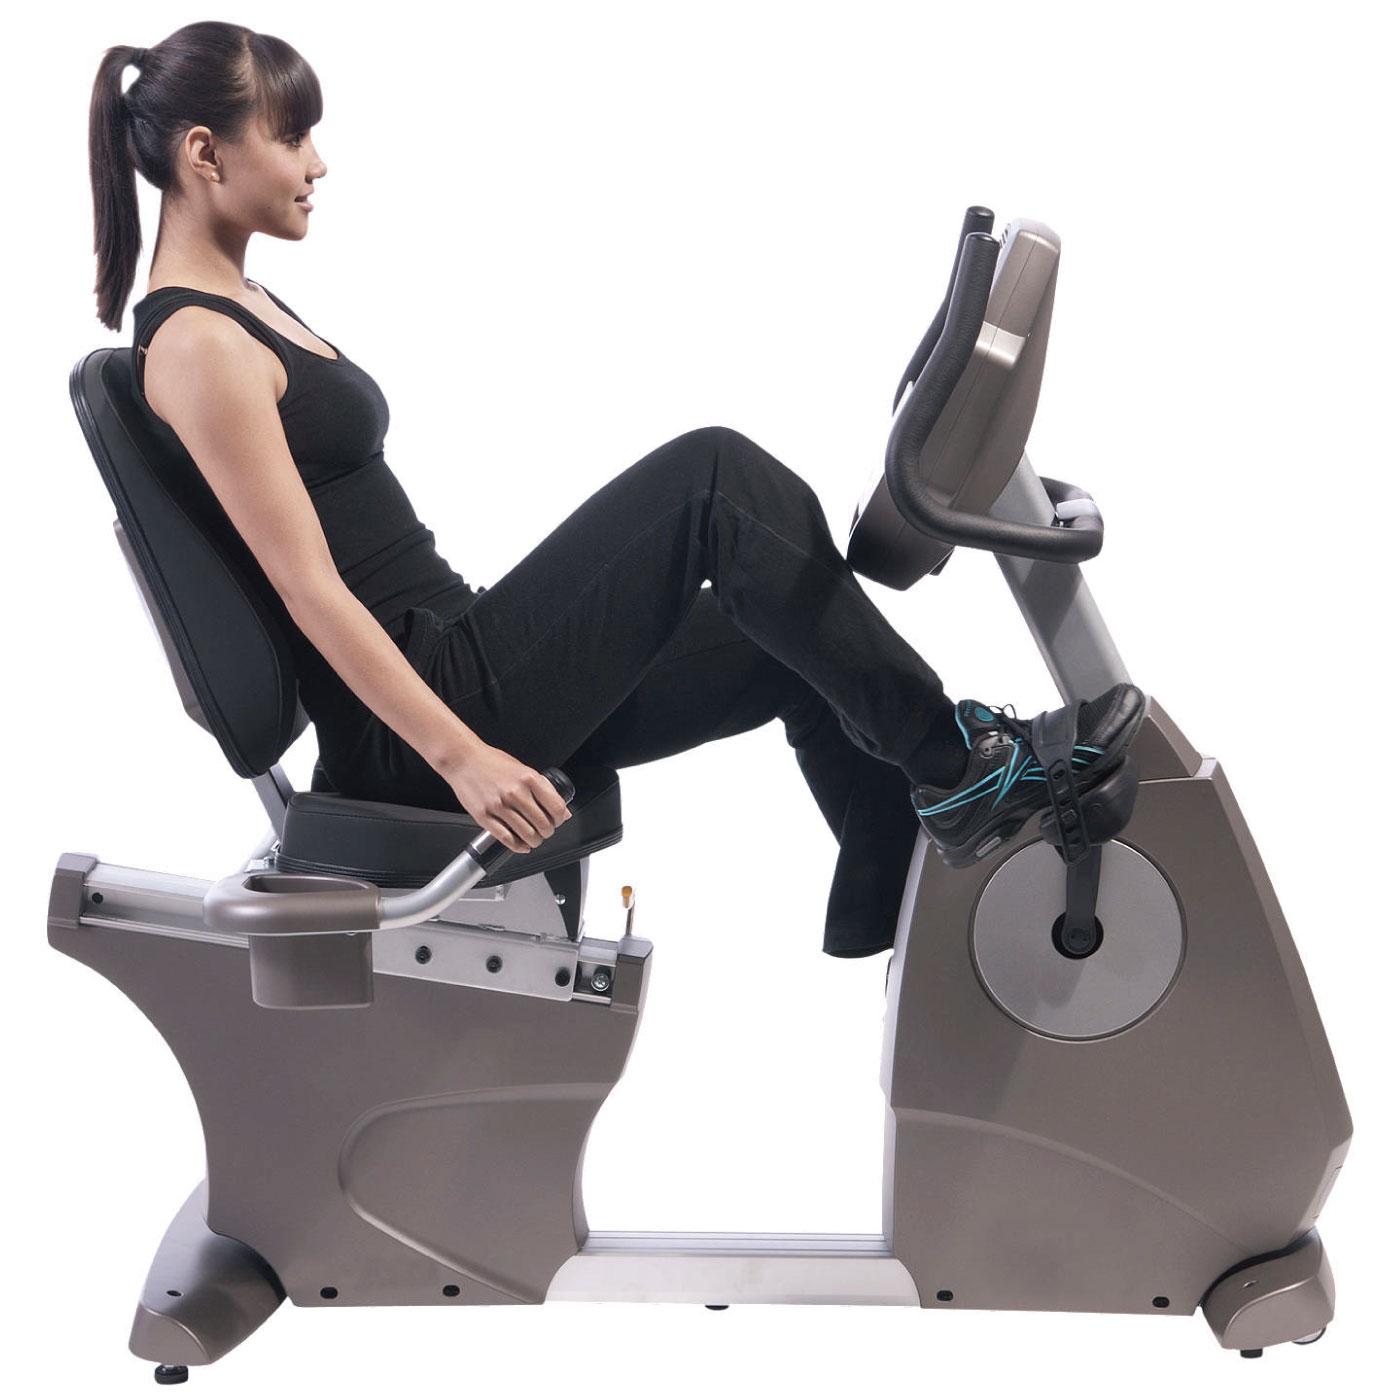 CR800/準業務用リカンベントバイク〈Spirit Fitness〉《ダイヤコ》